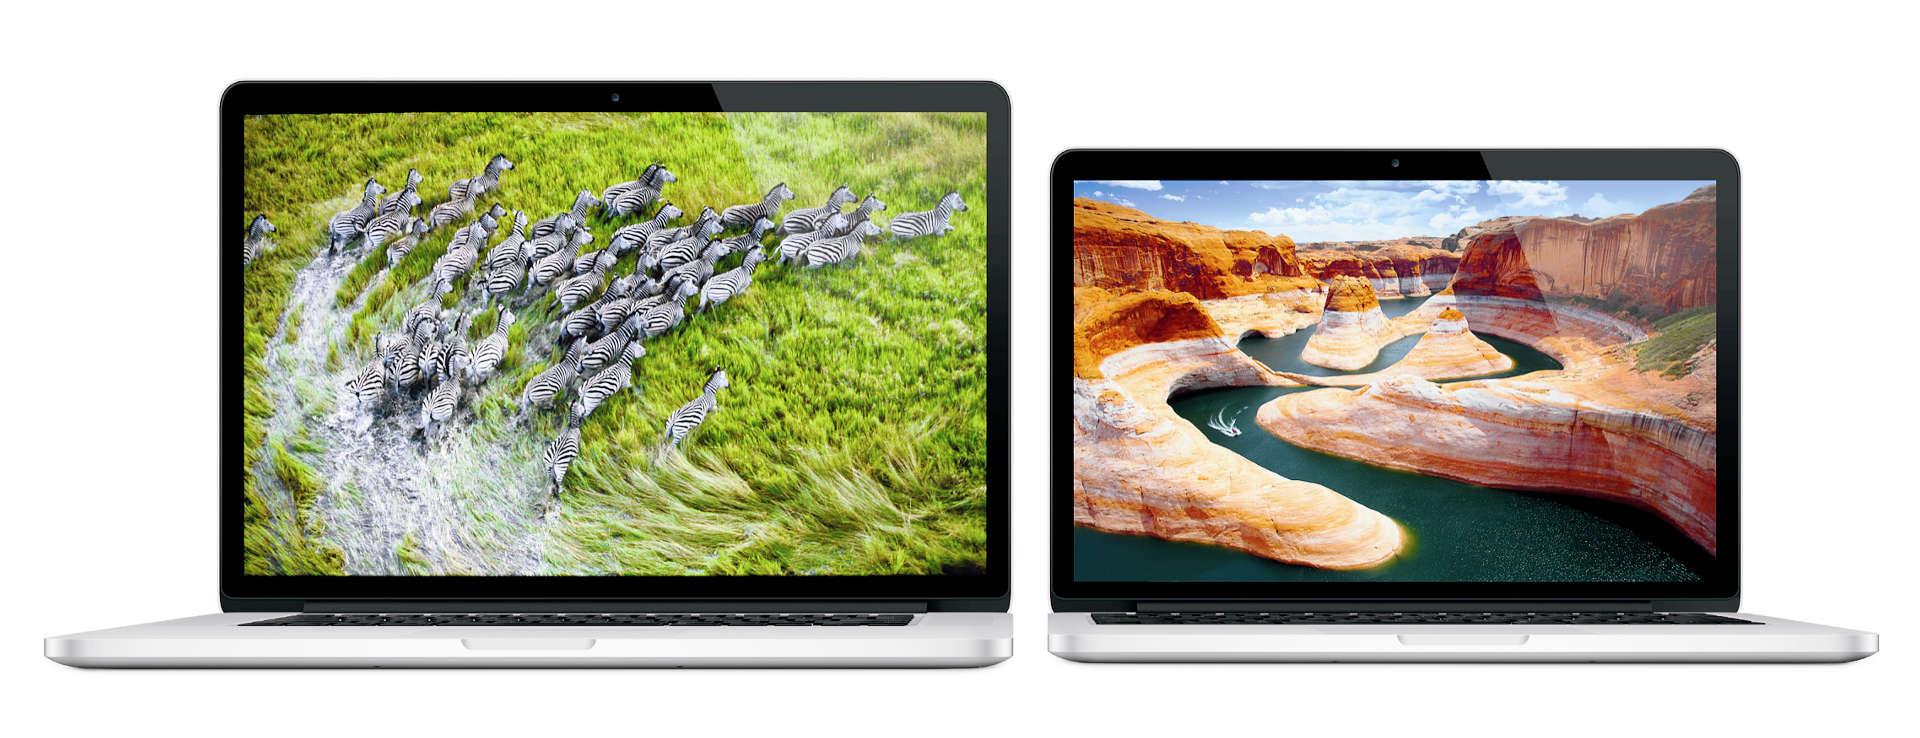 Refurbished Retina Macbook Pro Buyers Guide